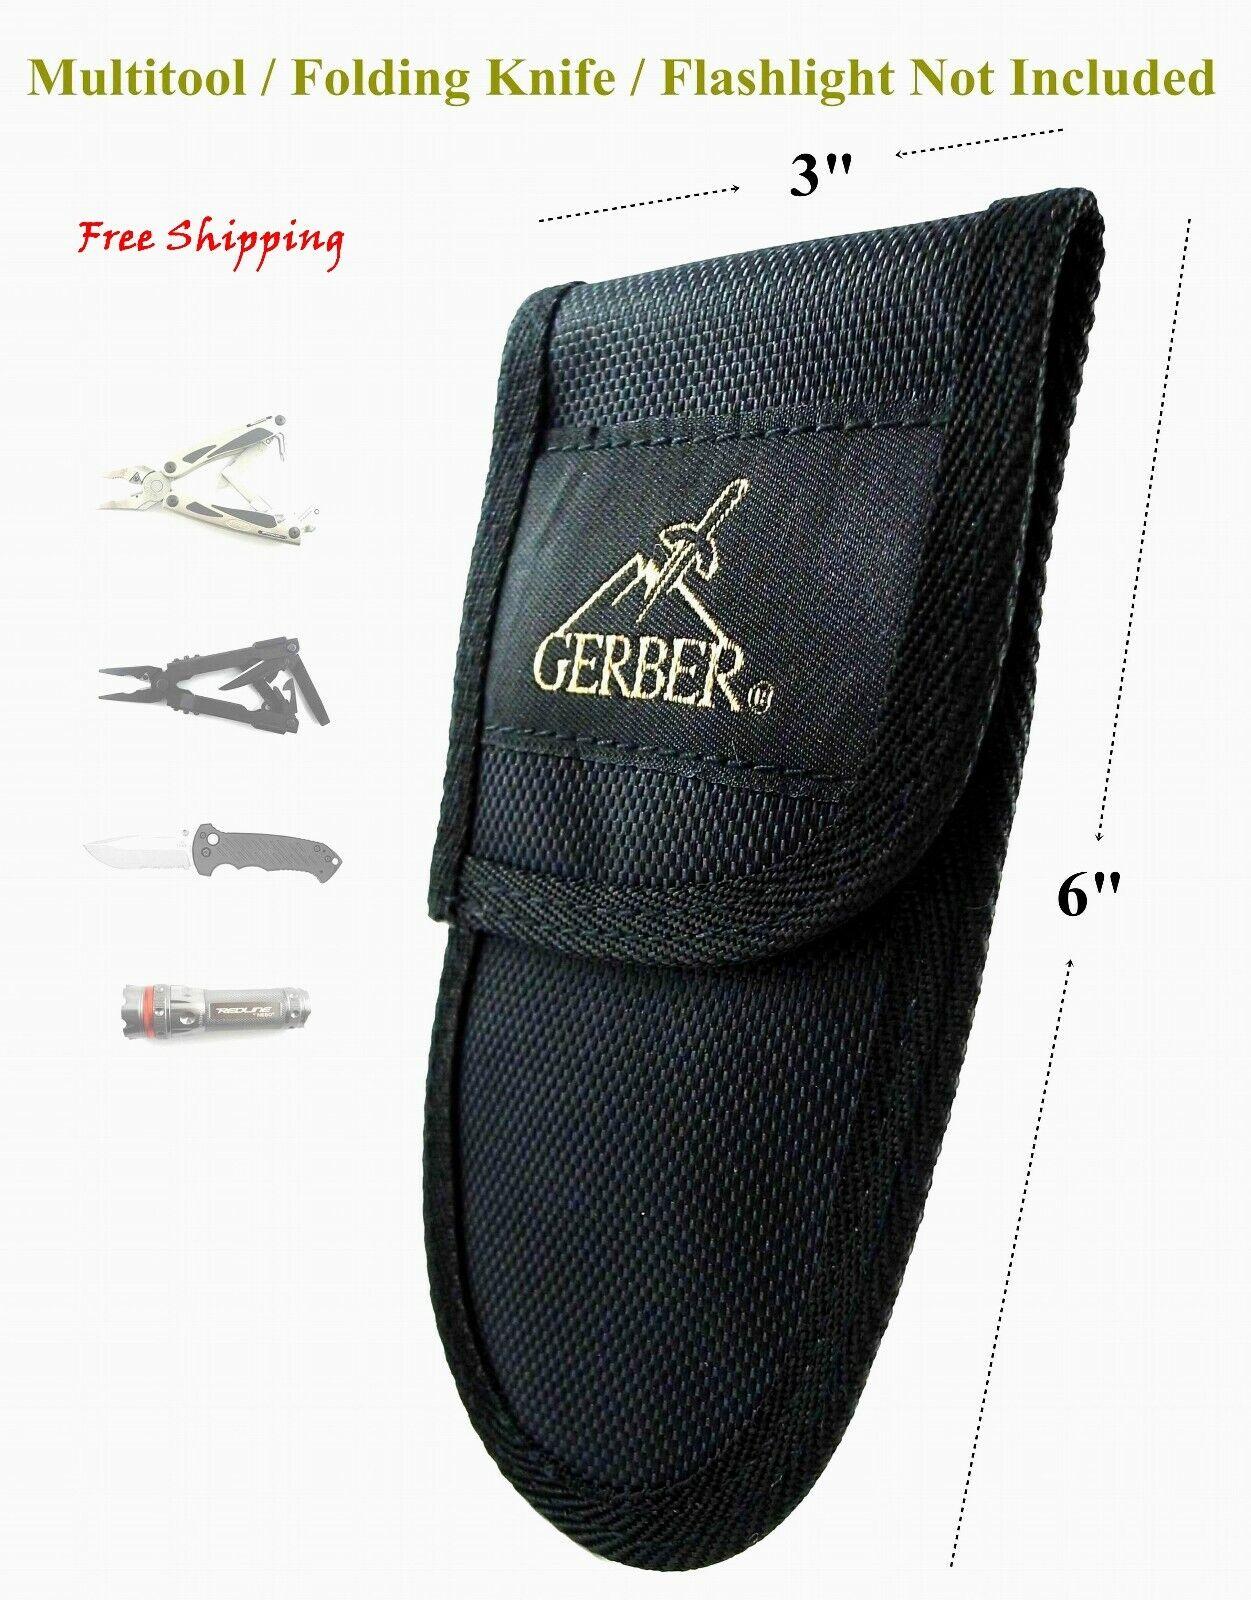 1 BRAND NEW, 15cm x 8 cm UNUSED GERBER MULTI TOOL / KNIFE PO